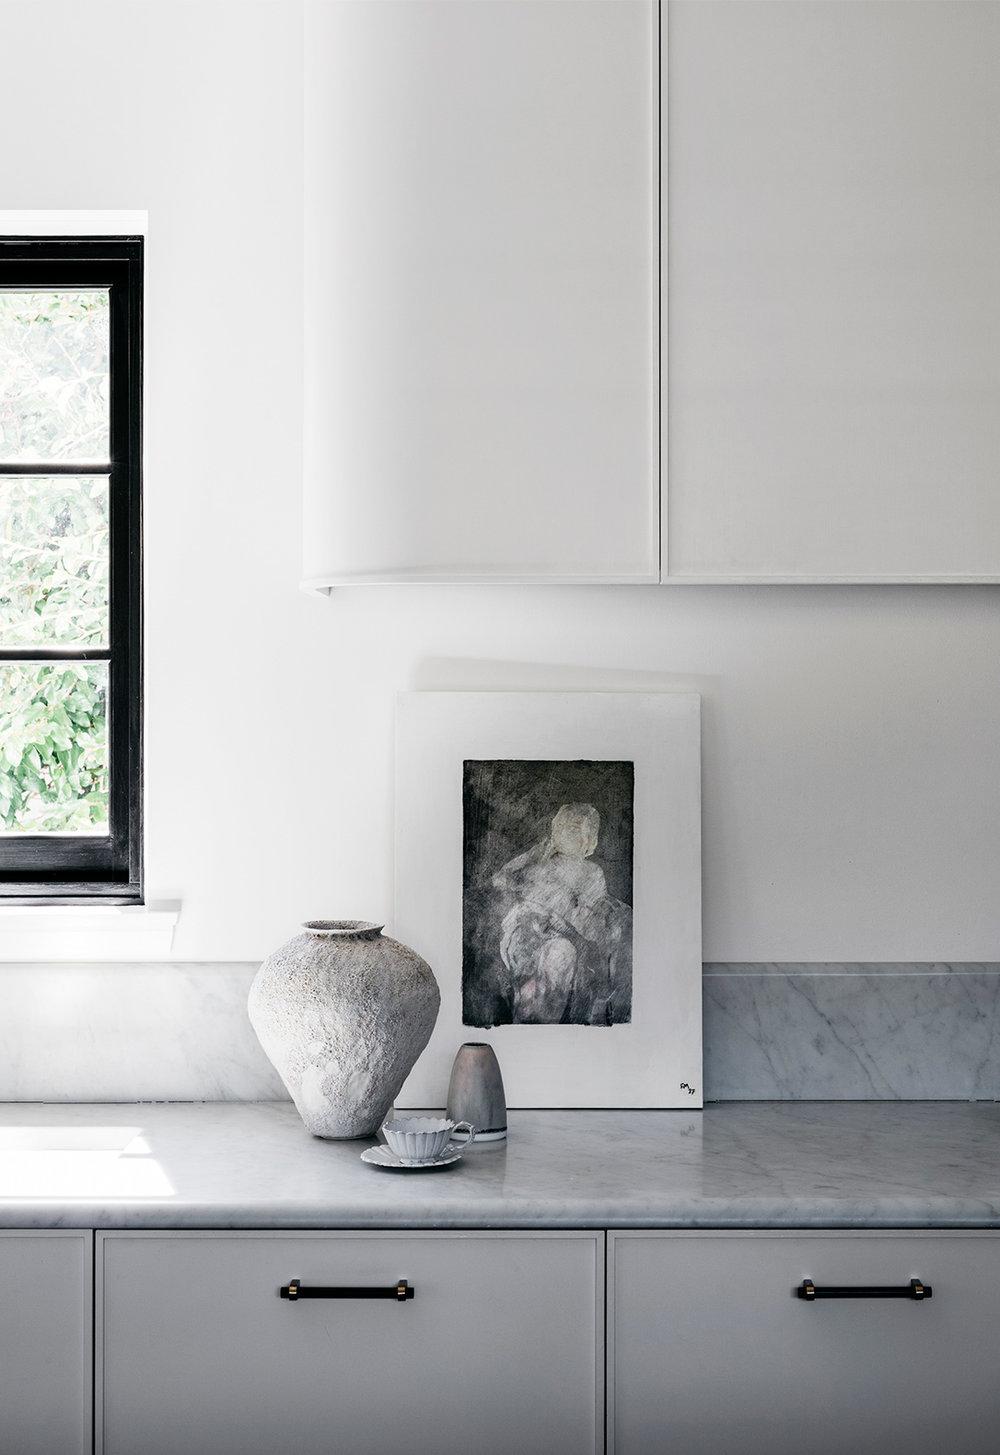 Arent-Pyke-PymbleHouse-gallery-image-half-width-14-@2x-1.jpg